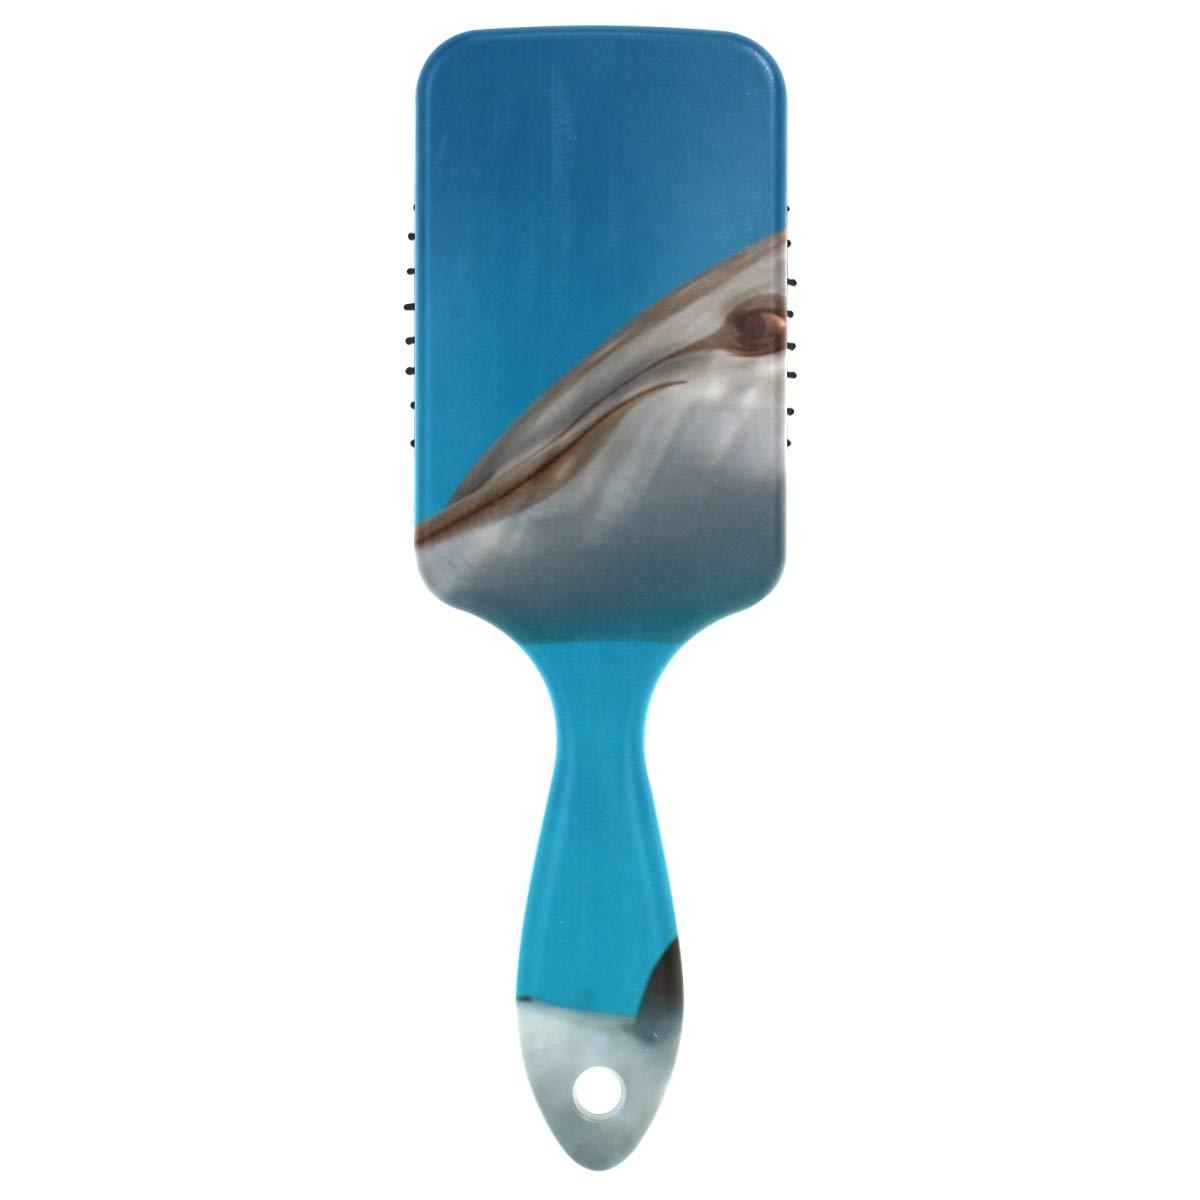 Massage Comb A surprise price is realized Sea Fish Cheap sale Blue Shark Straightene Hairbrush Detangler